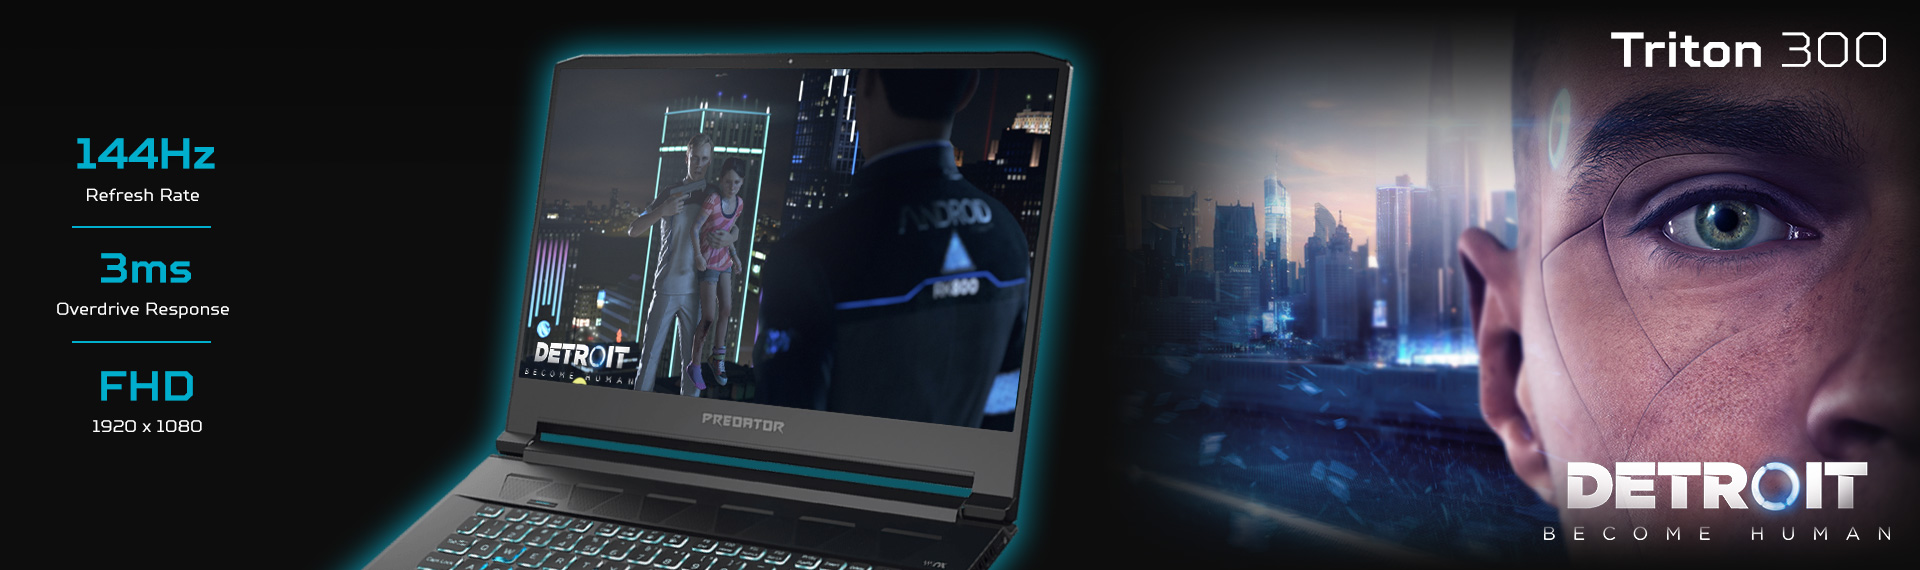 Alasan Predator Triton 300 Kompatibel untuk Game Detroit: Become Human